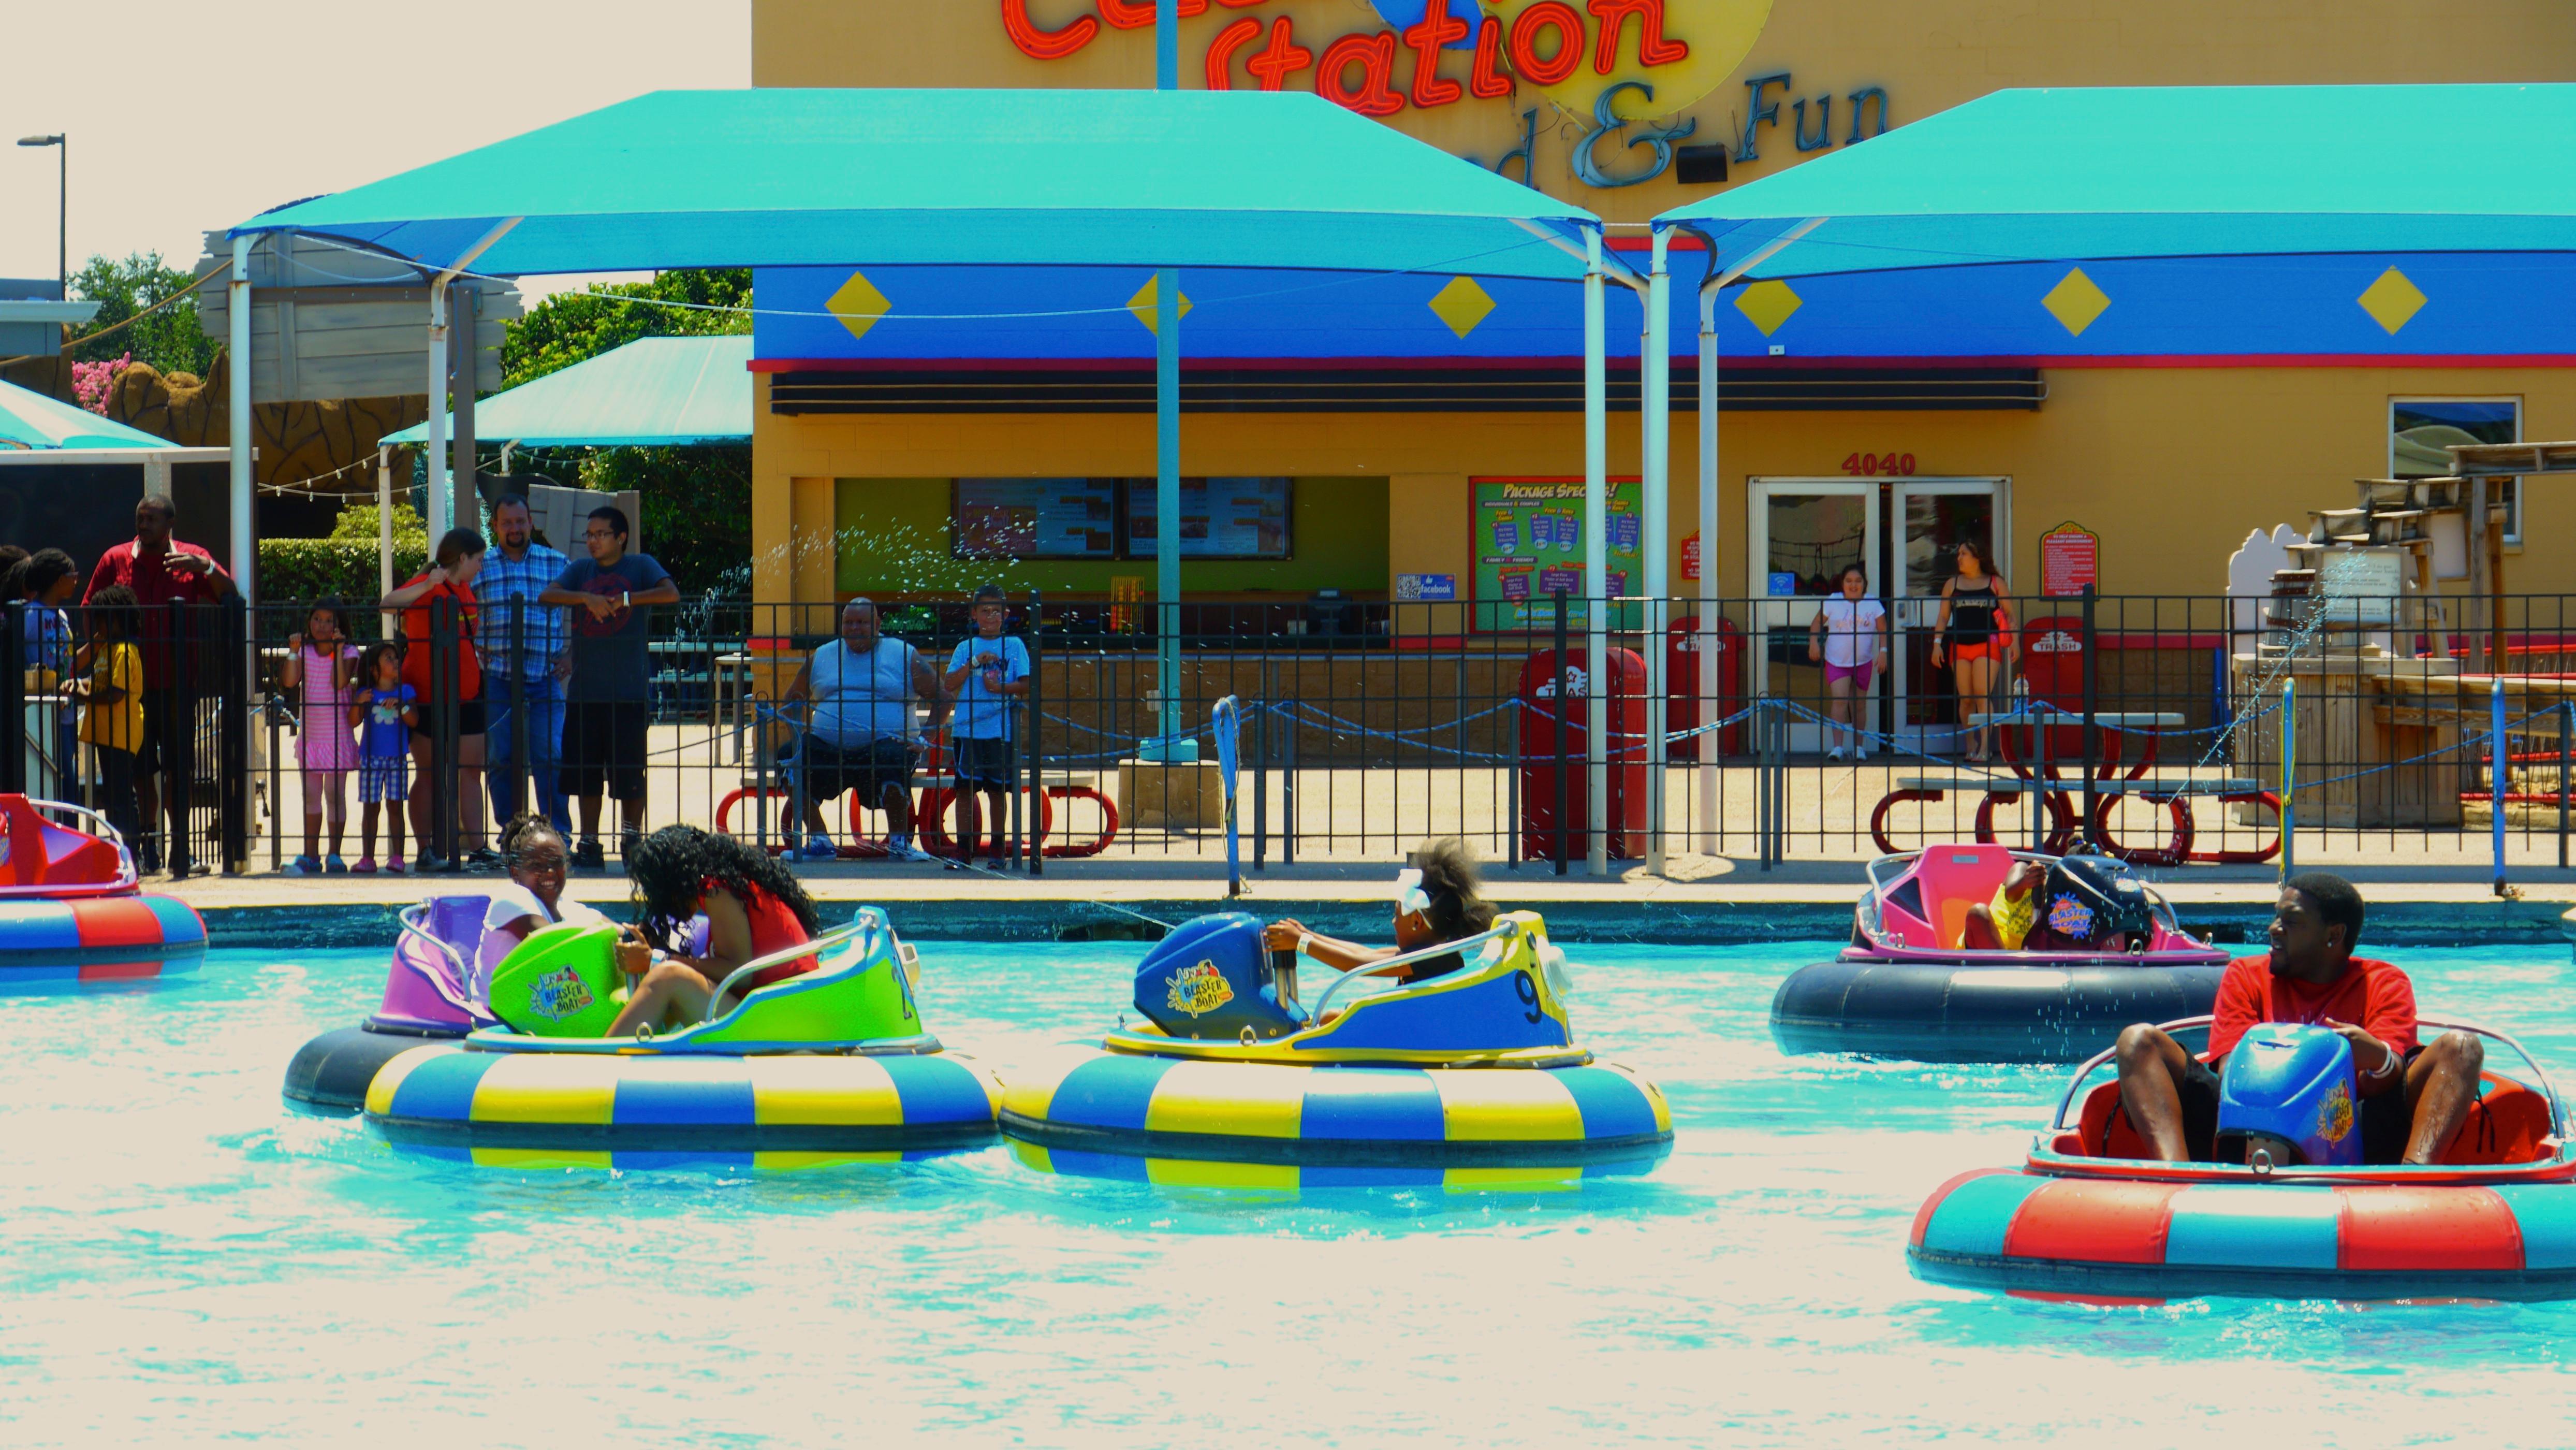 Celebration station in mesquite tx theme park 972 279 - Vanston swimming pool mesquite tx ...